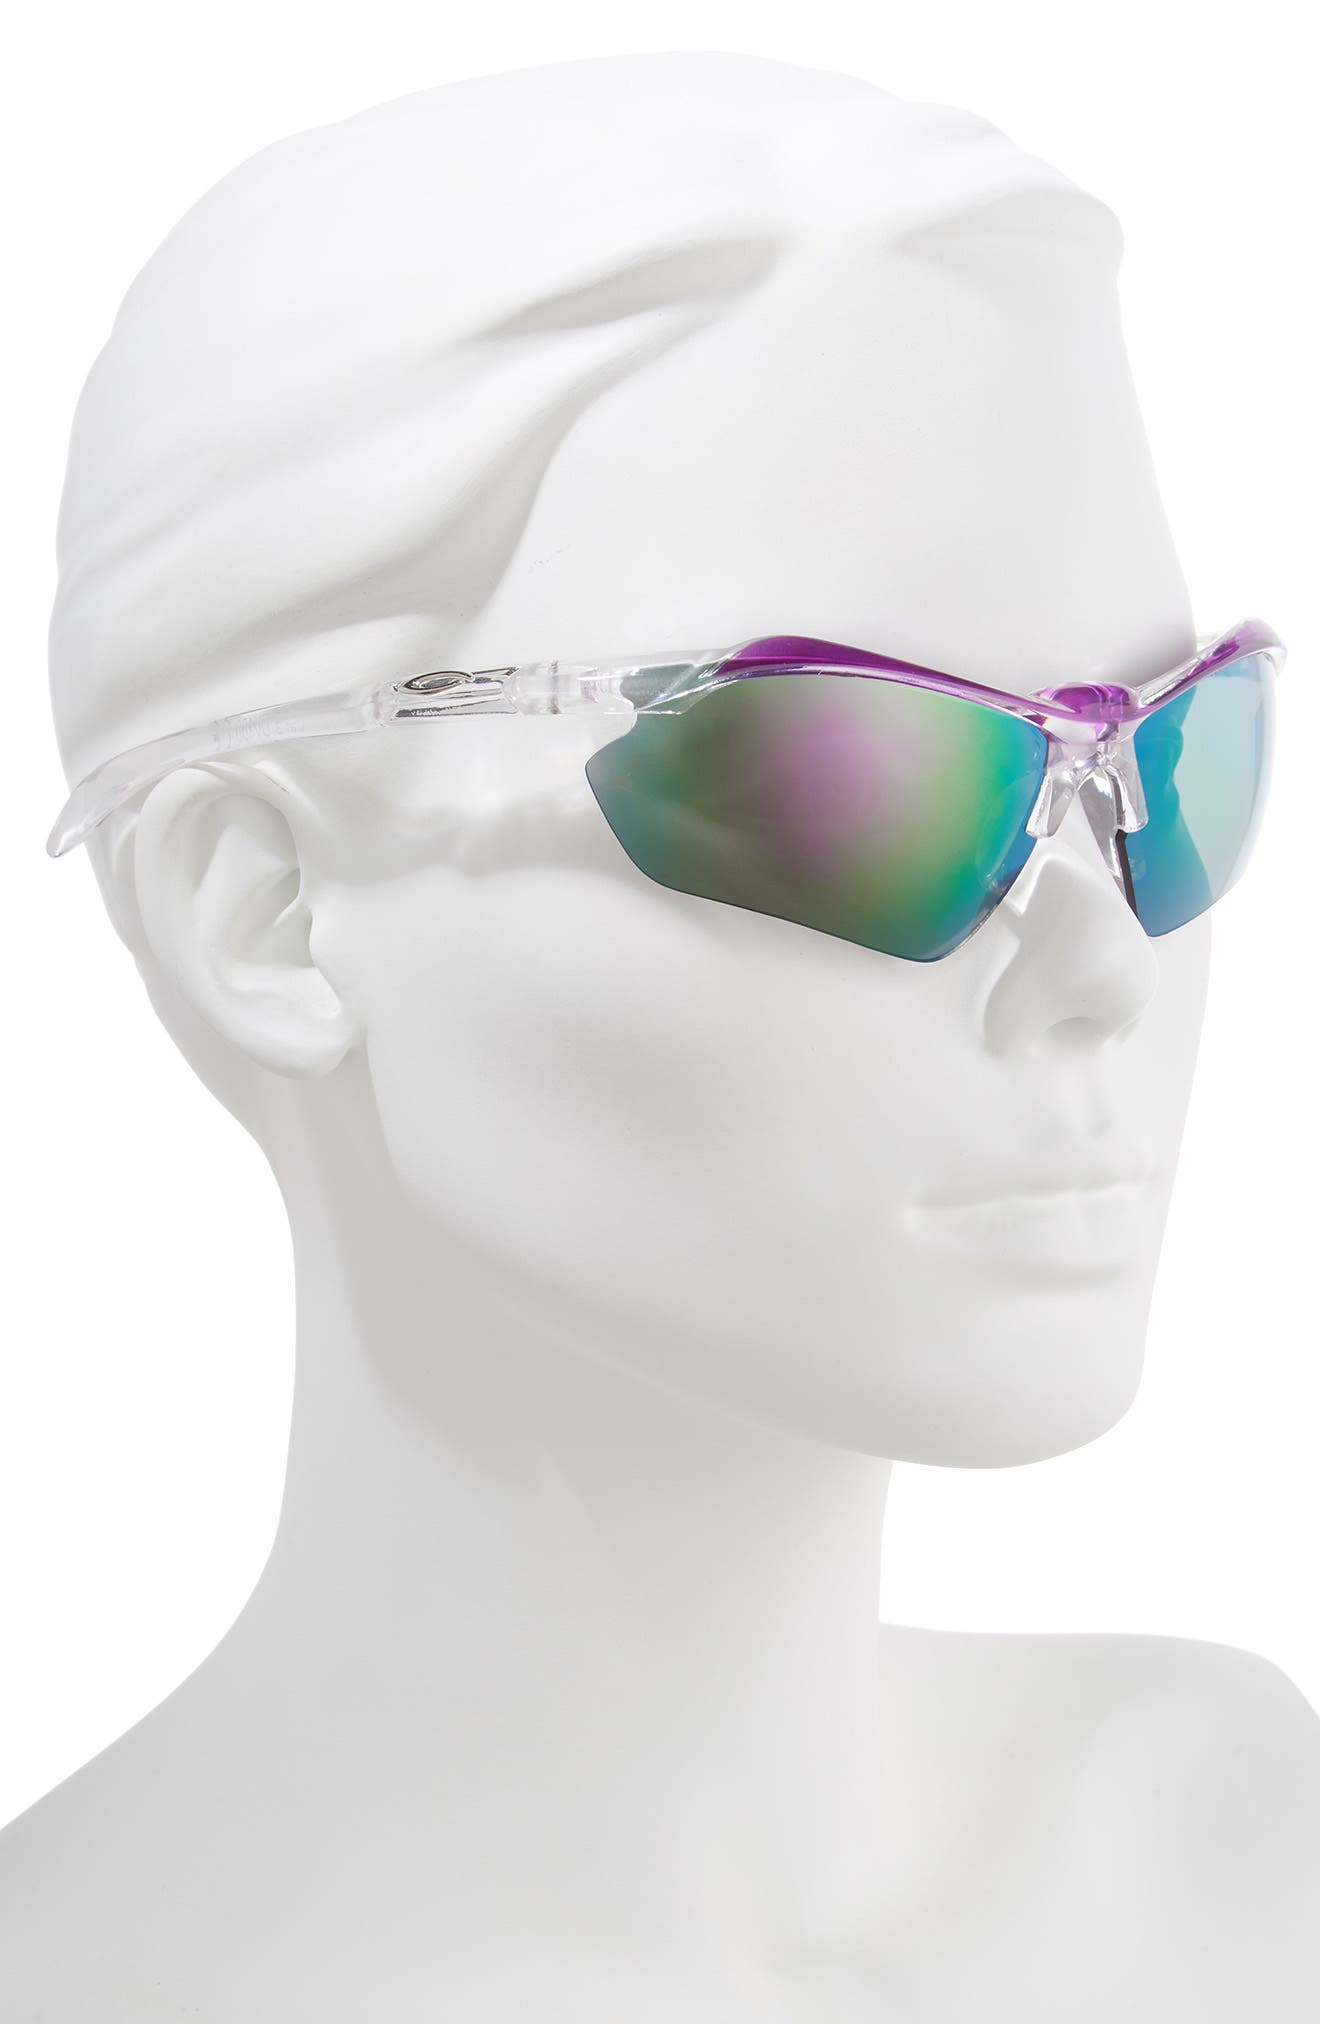 68mm Sport Shield Sunglasses,                             Alternate thumbnail 2, color,                             CLEAR/ PURPLE